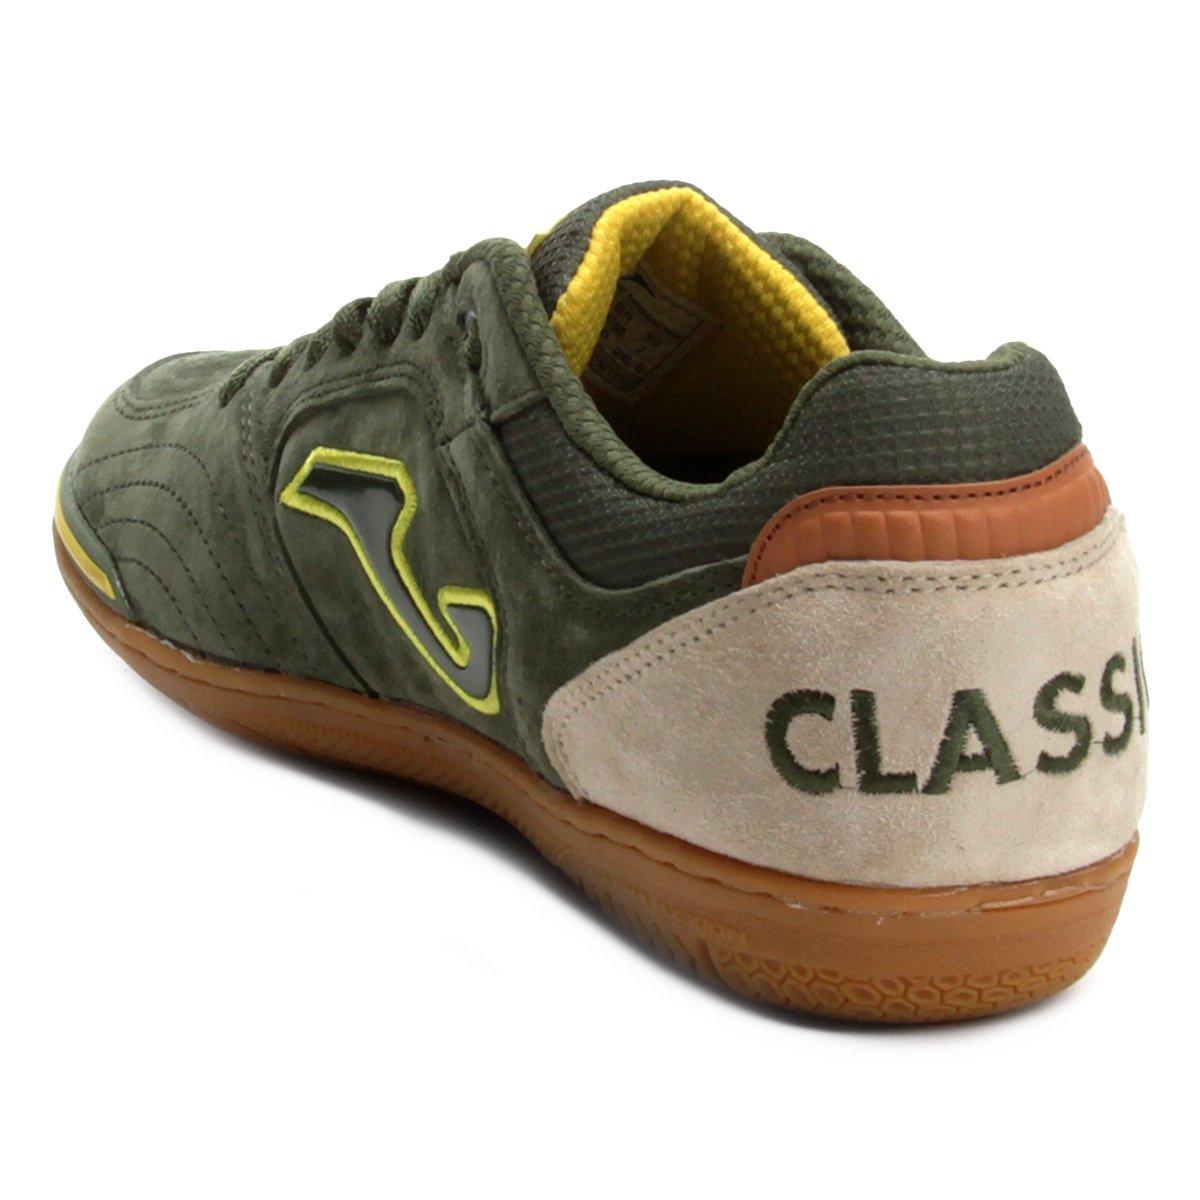 Chuteira Futsal Joma Classic Nobuck IN - Verde - Compre Agora  15f6b8b38be1f